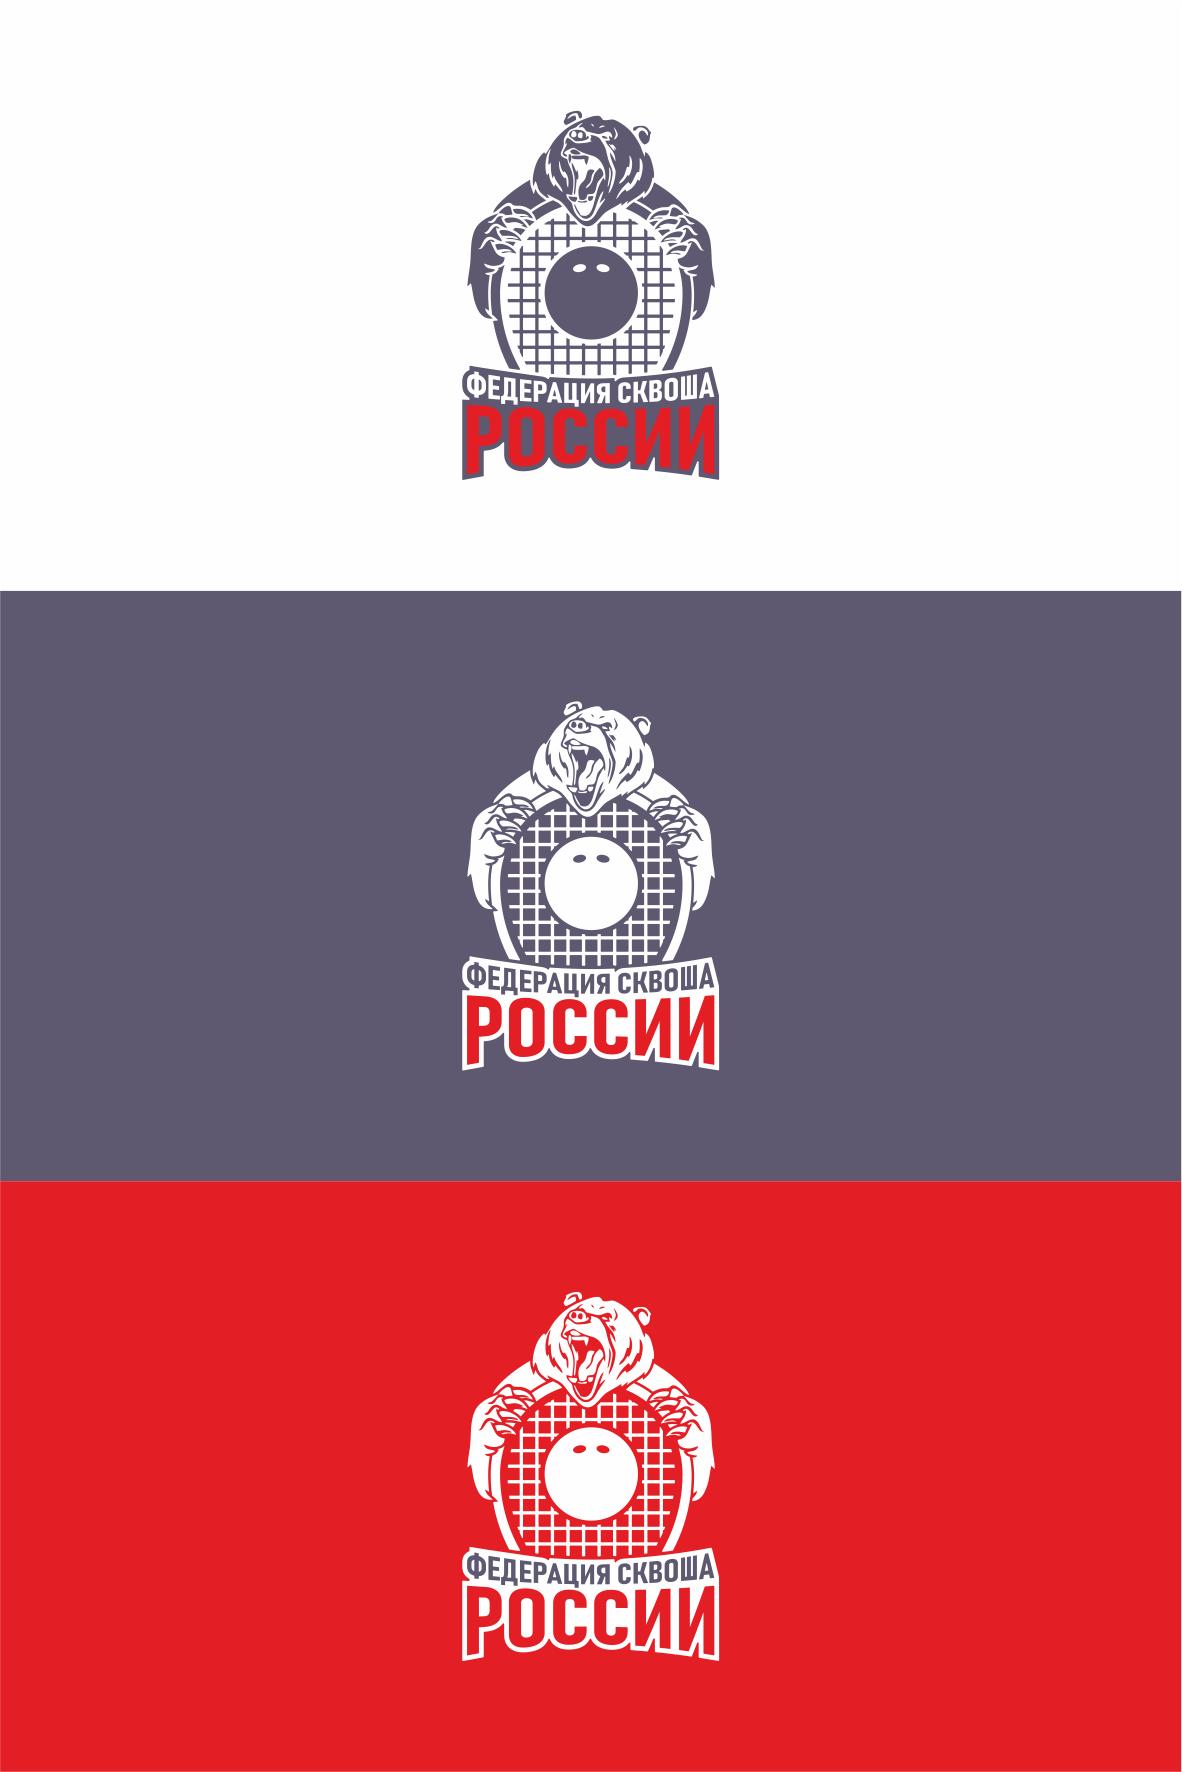 Разработать логотип для Федерации сквоша России фото f_9435f3128b62cbbb.png